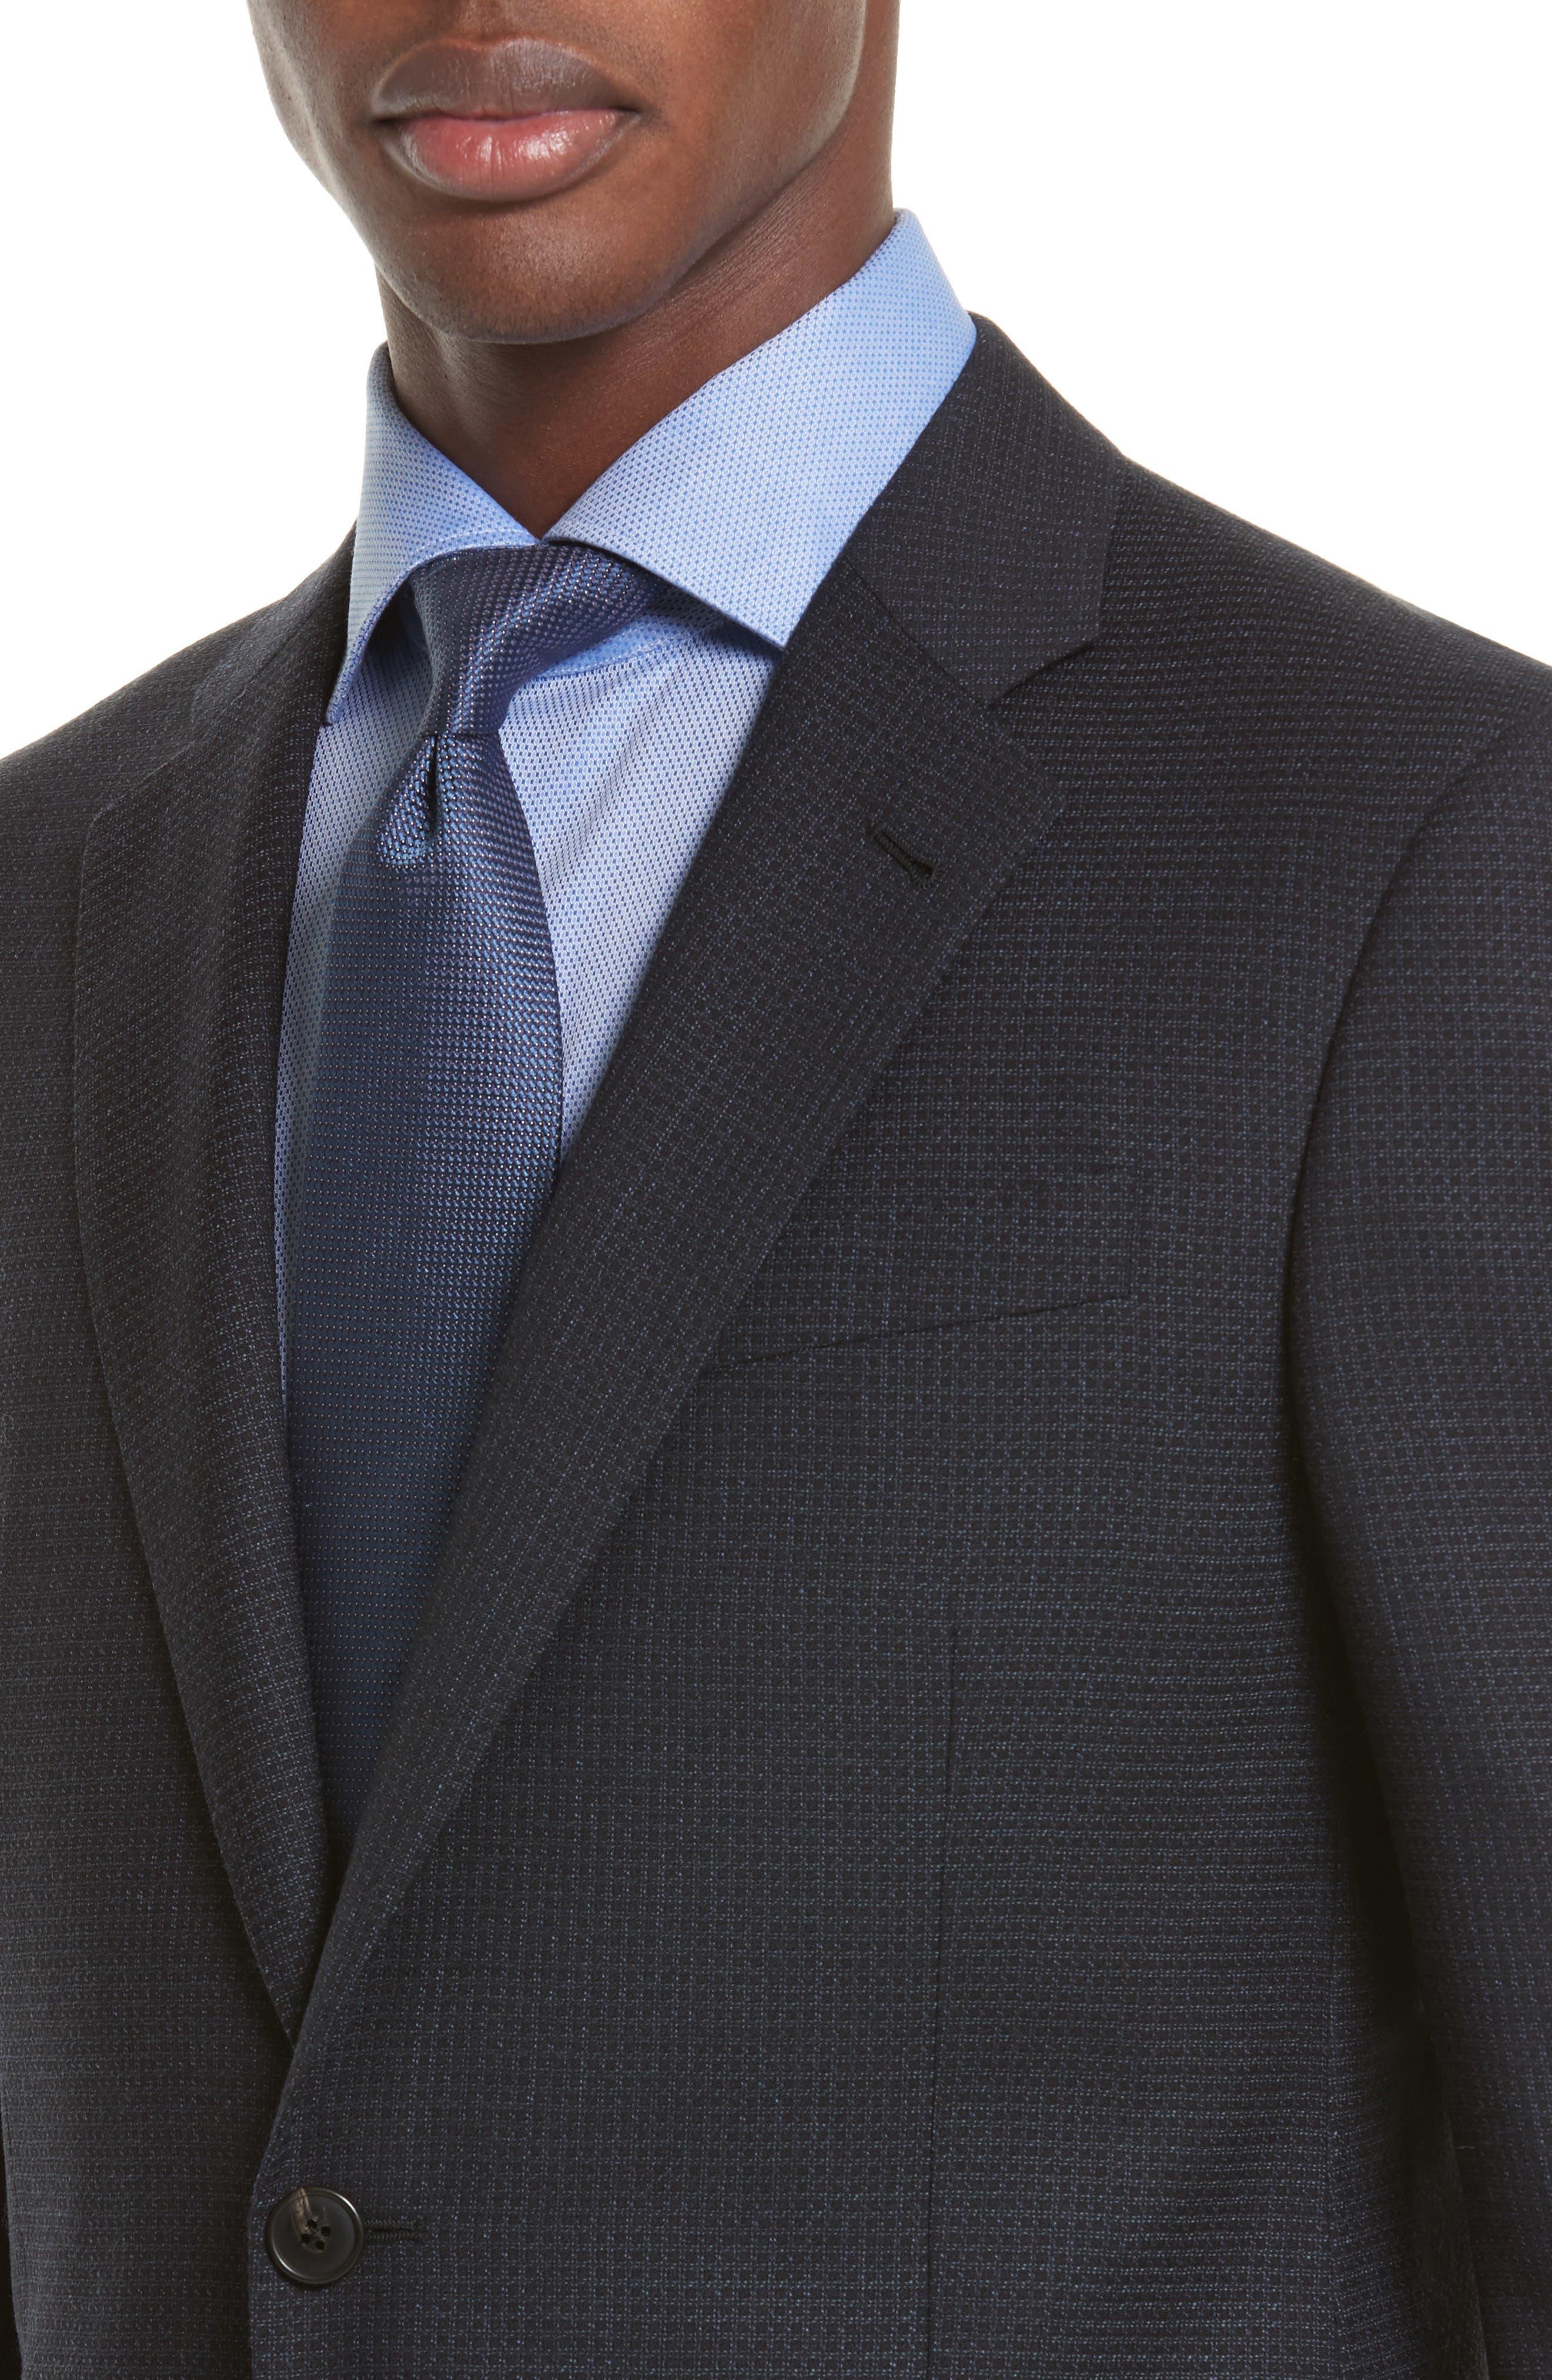 Trim Fit Check Wool Sport Coat,                             Alternate thumbnail 4, color,                             410